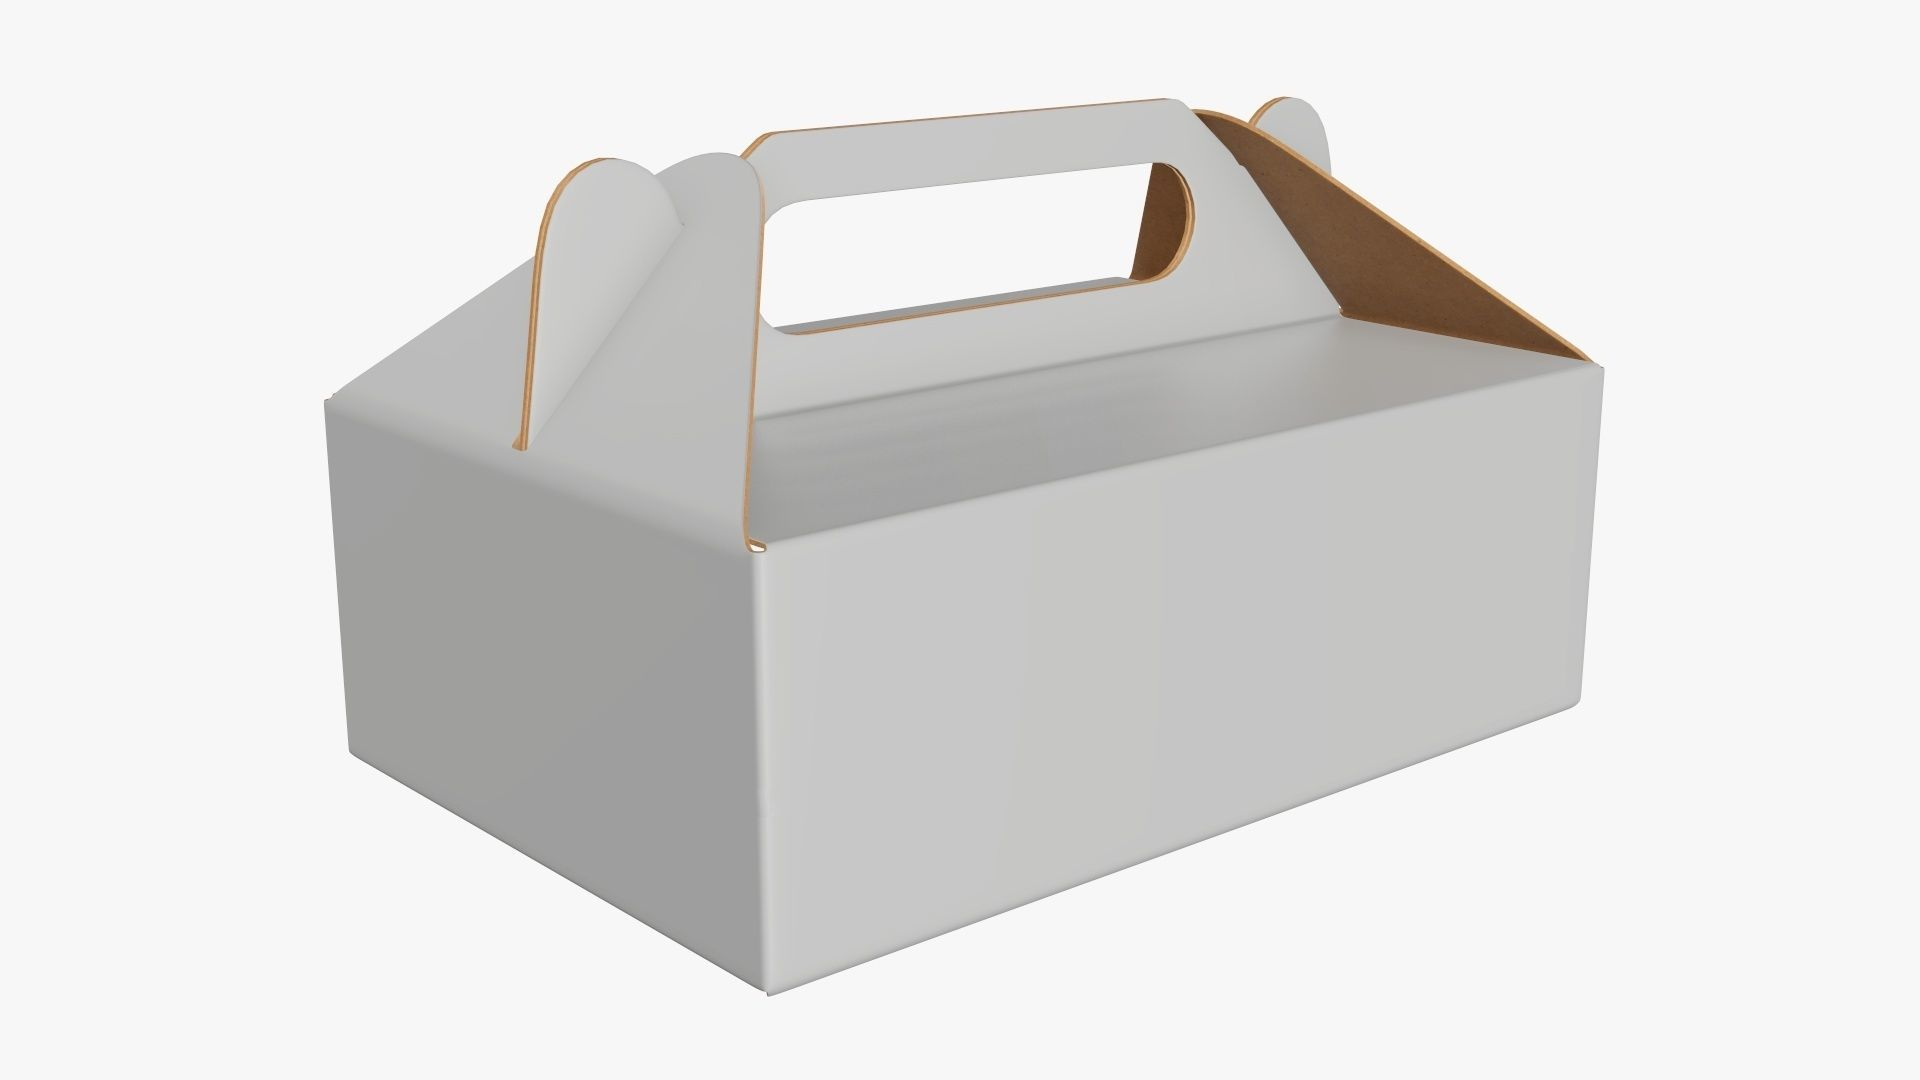 Gable box cardboard food packing 05 white